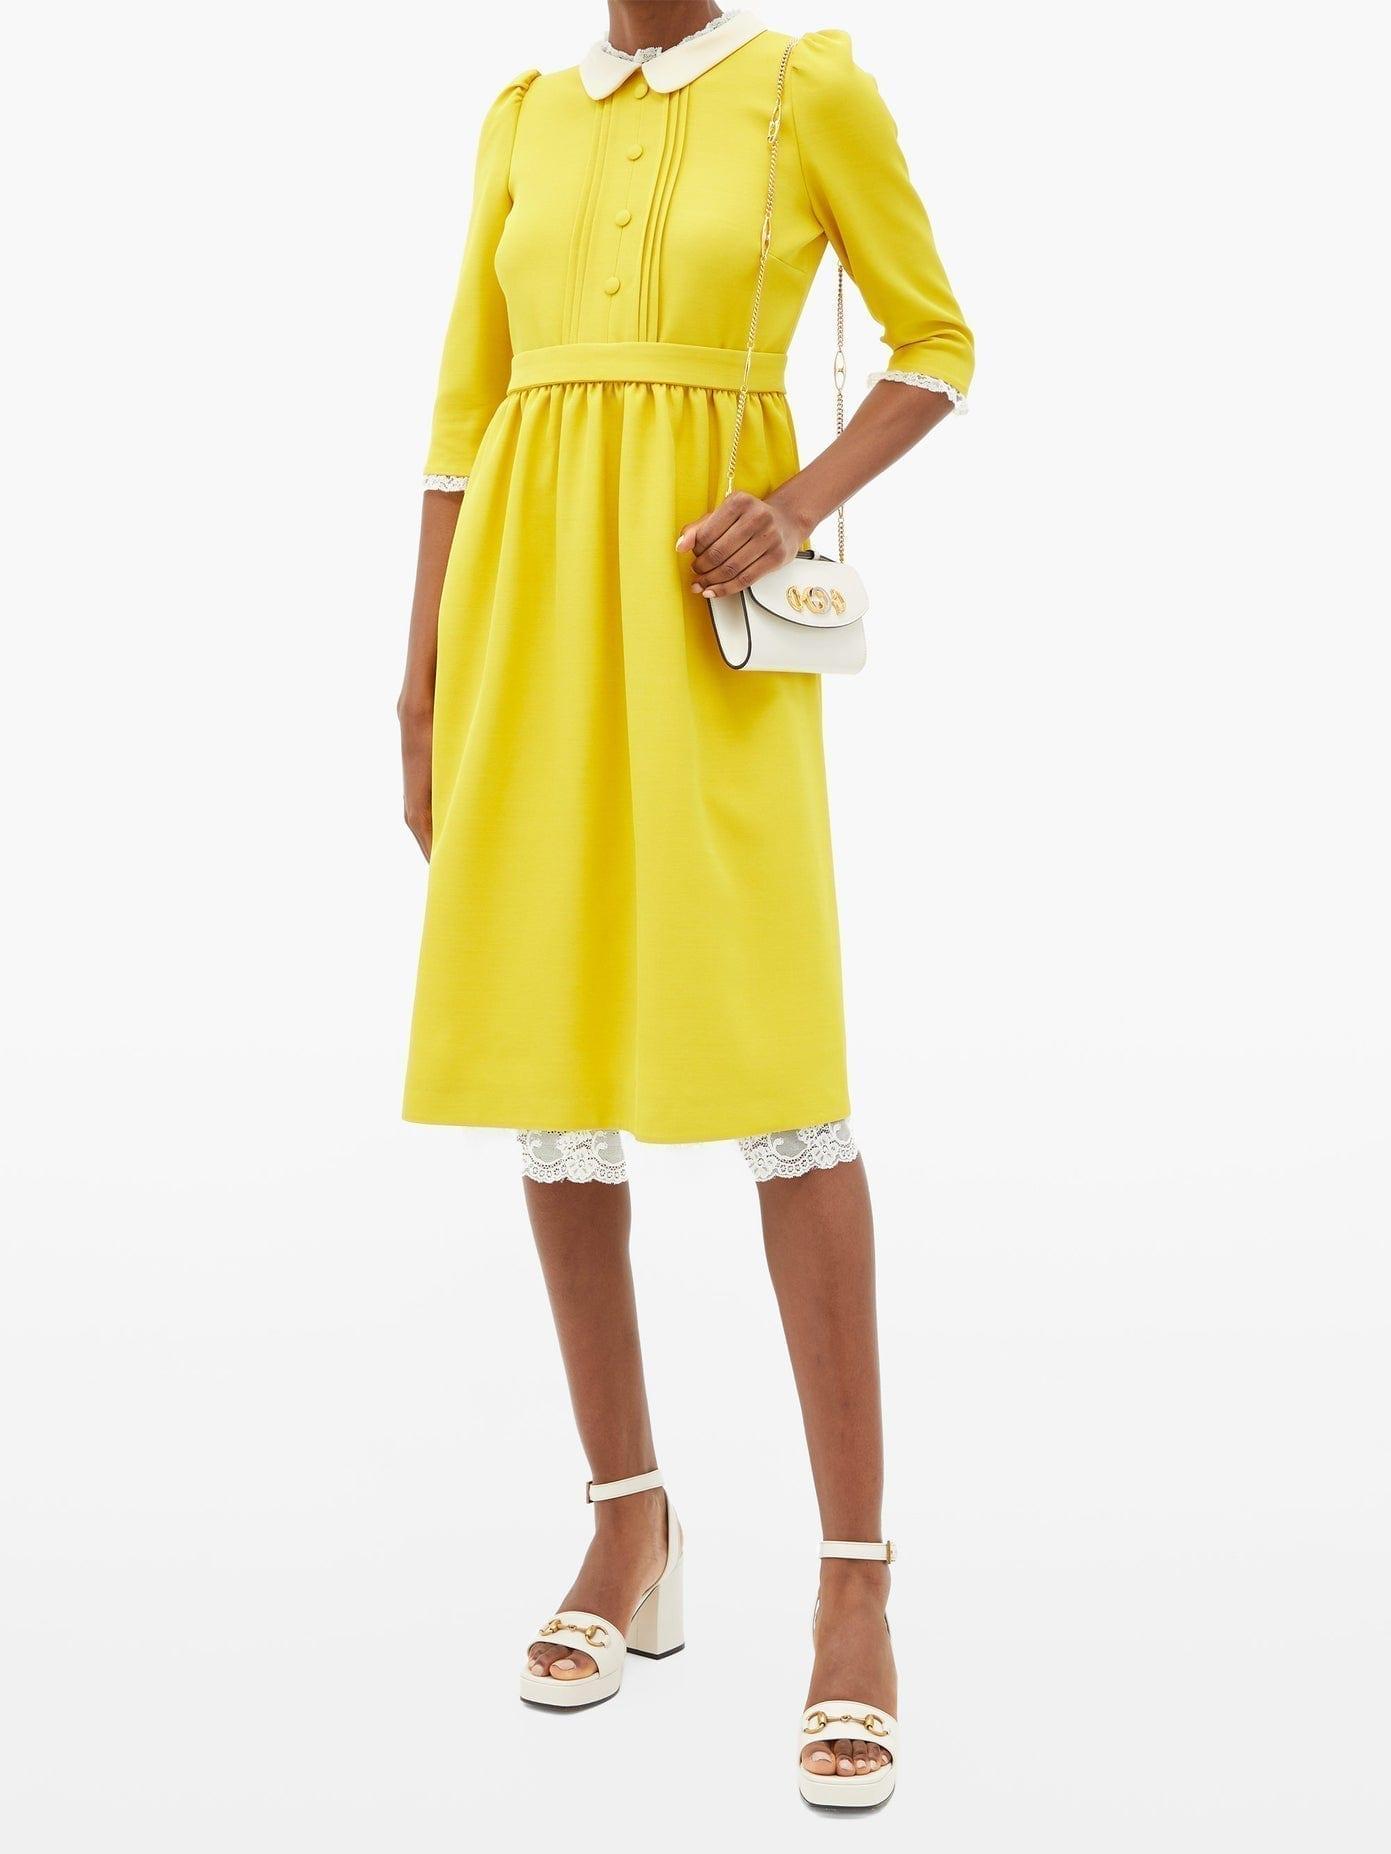 GUCCI Lace-trimmed Silk-blend Crepe Dress